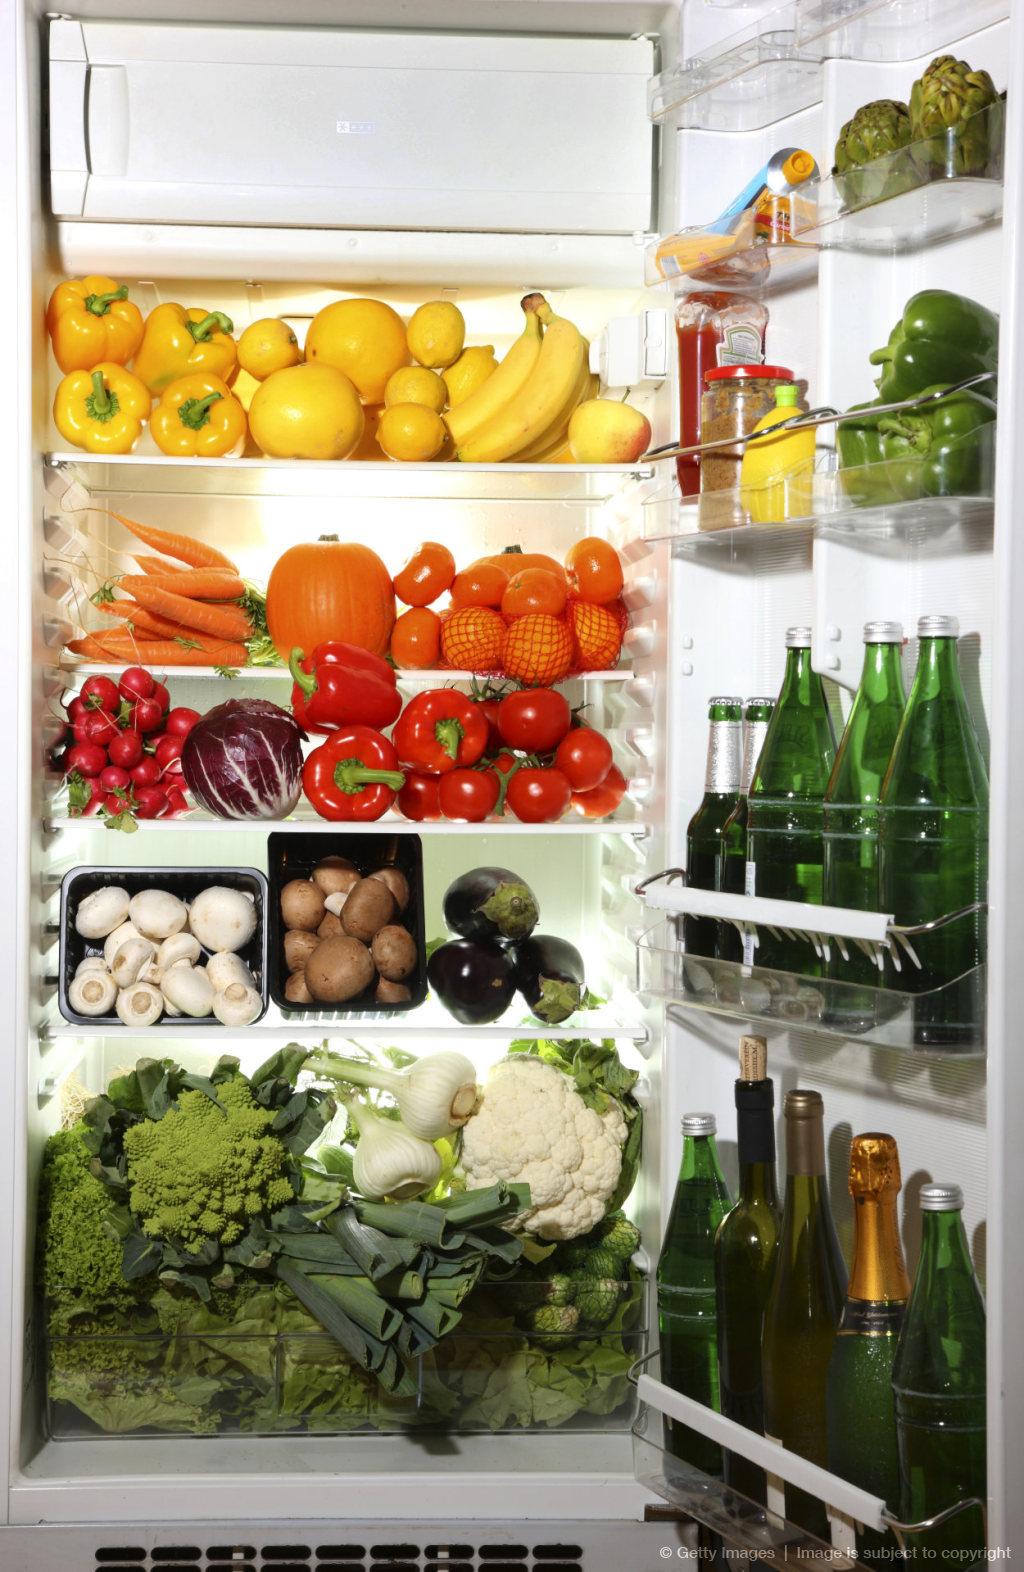 Jack Daniels Kühlschrank: Kompressor kühlschrank bus vw killen ...